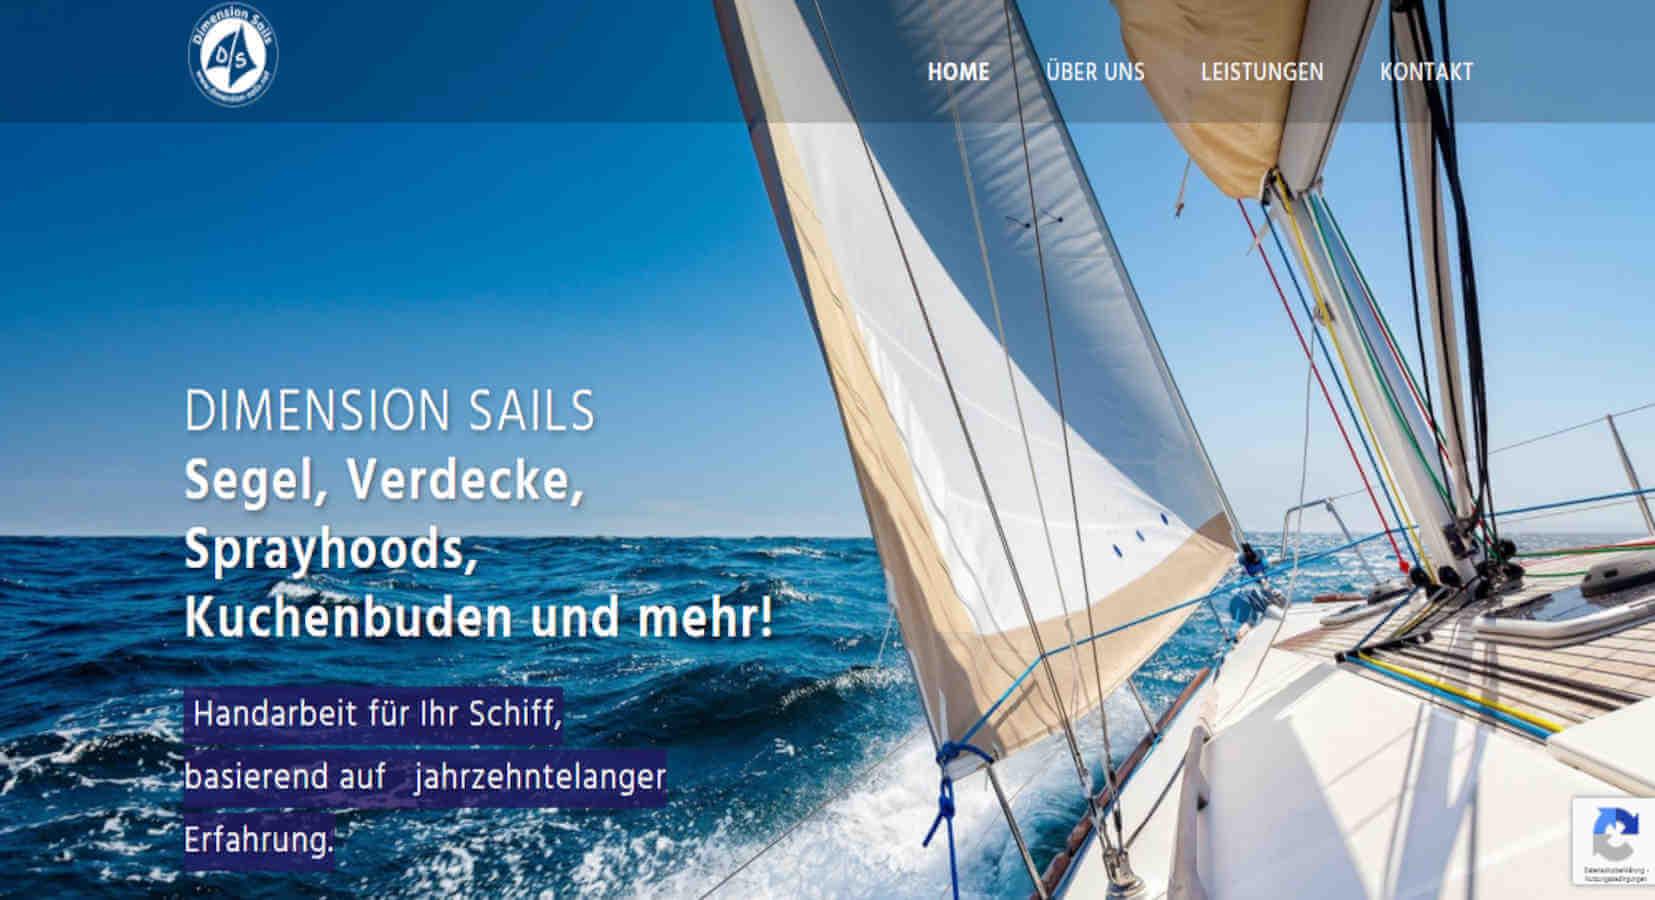 Dimension Sails GbR